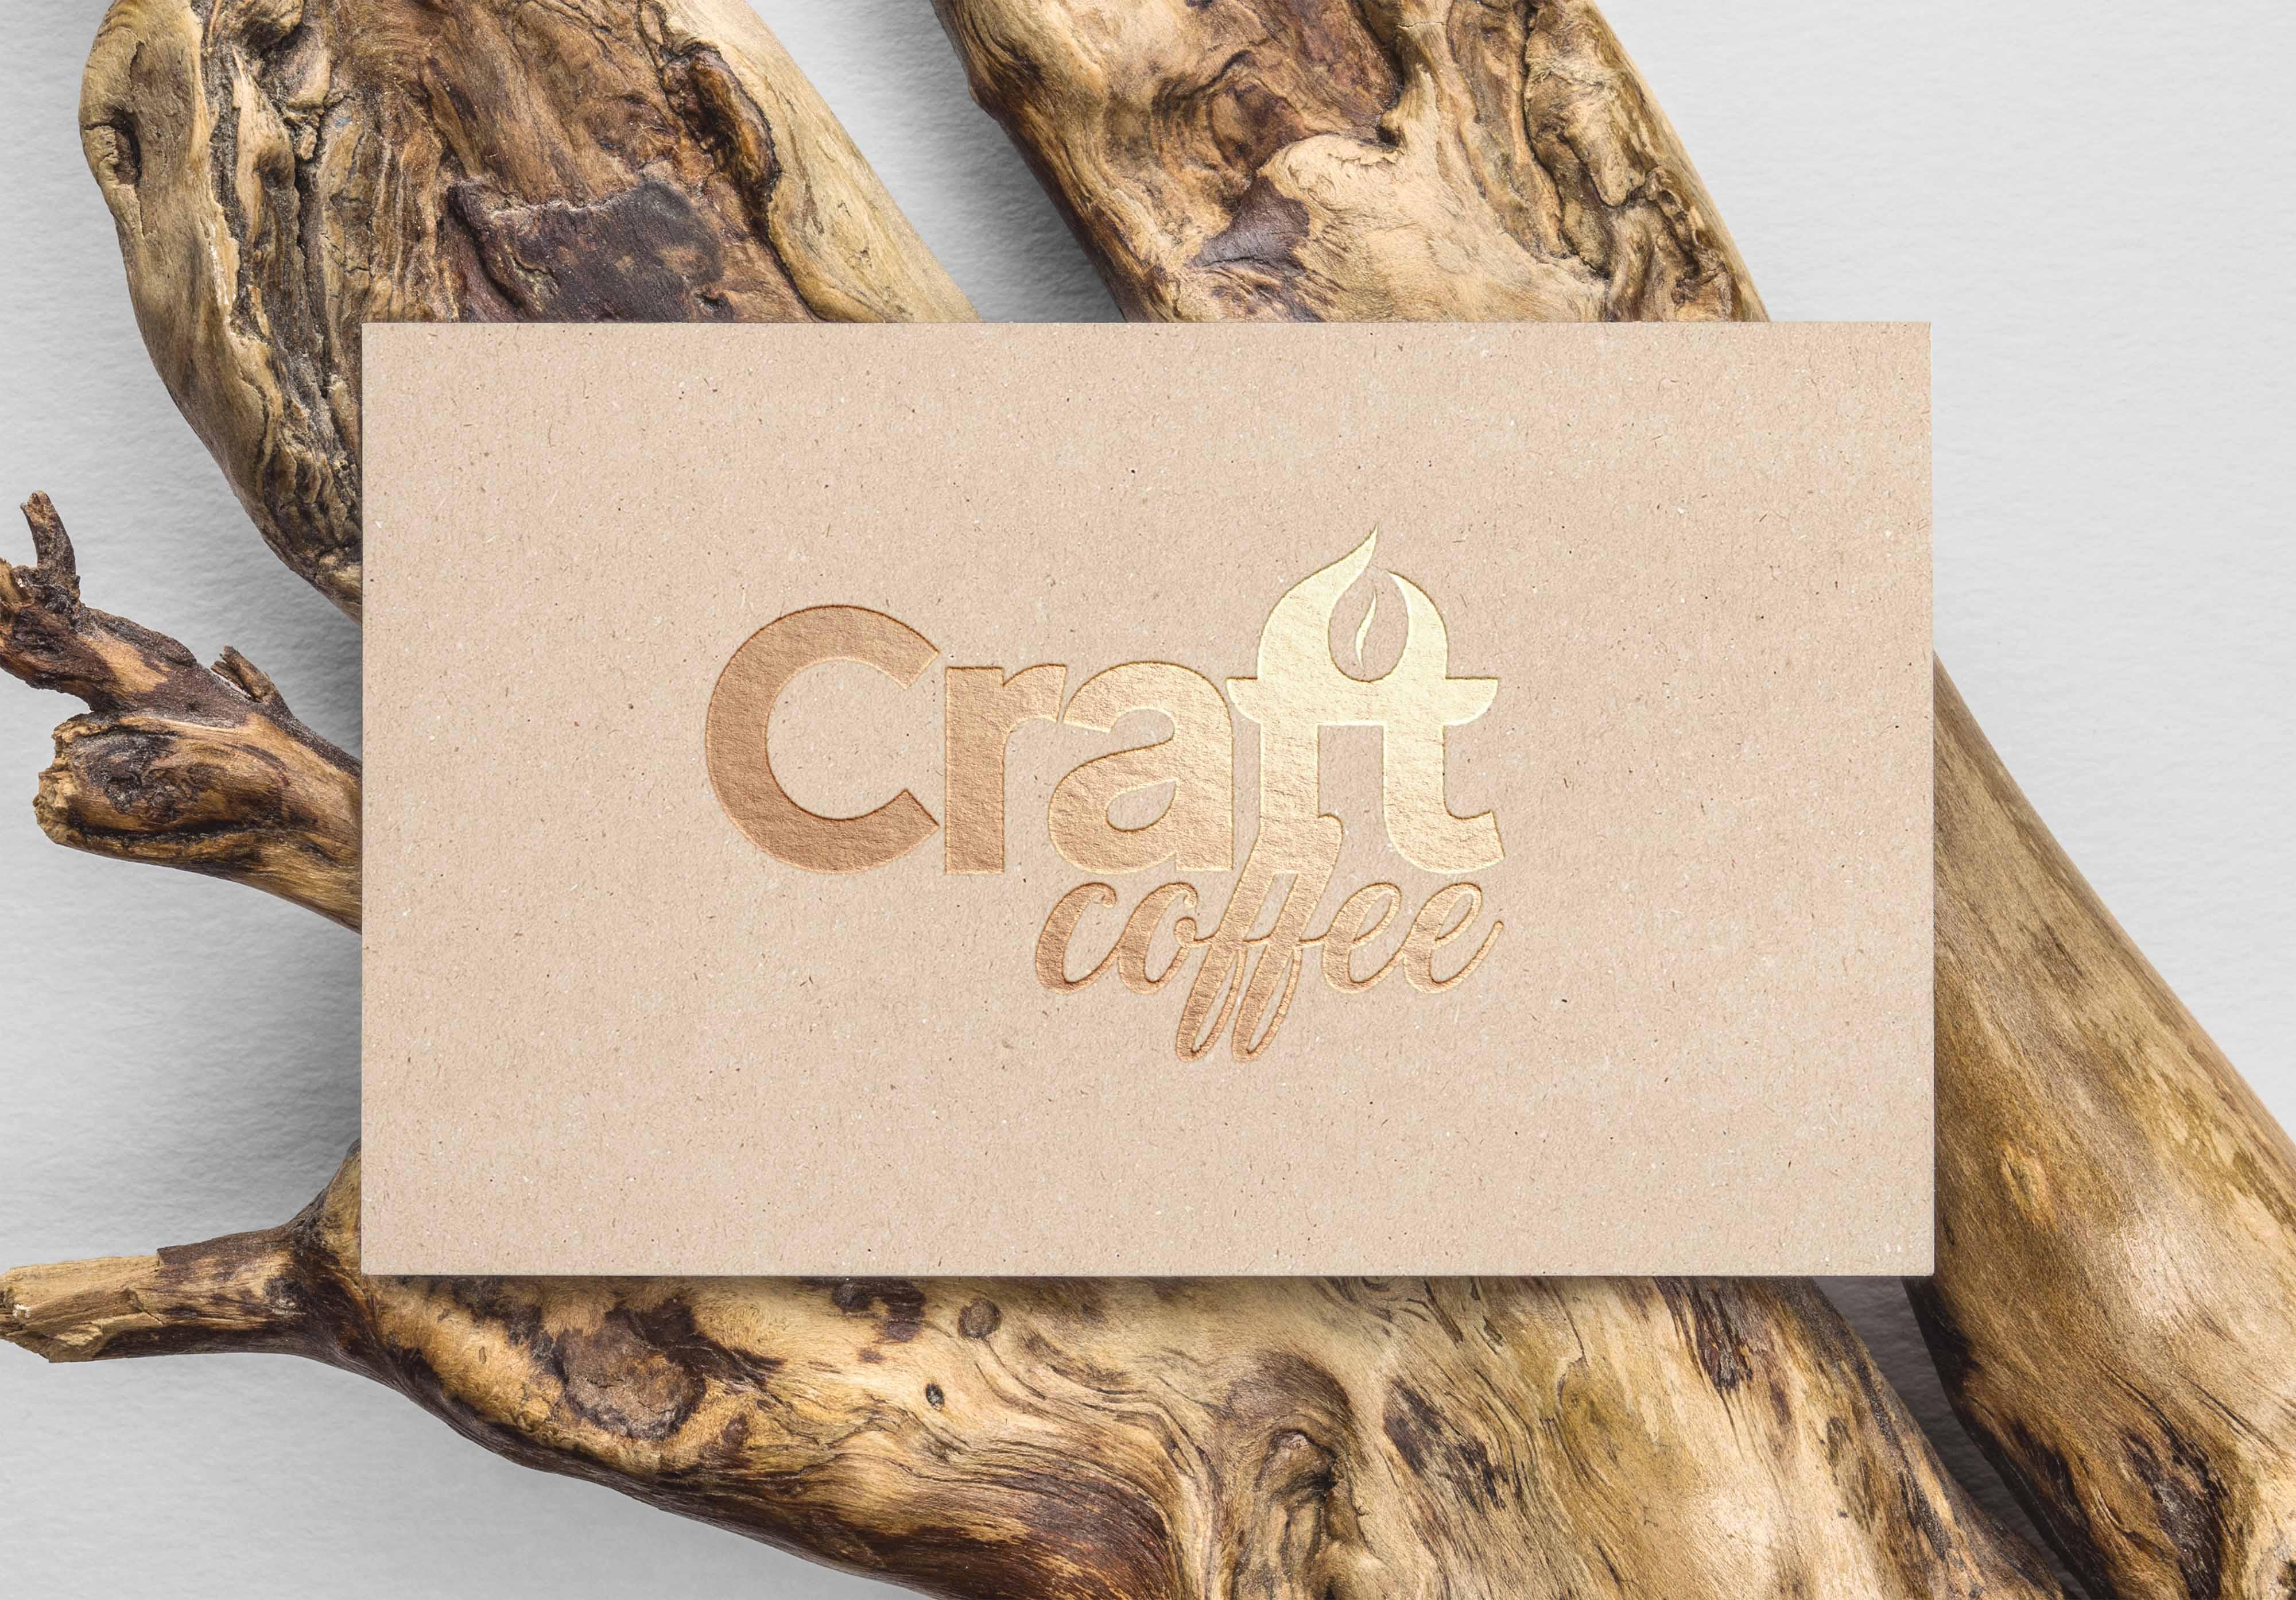 Логотип и фирменный стиль для компании COFFEE CULT фото f_8745bc089e76b59a.jpg